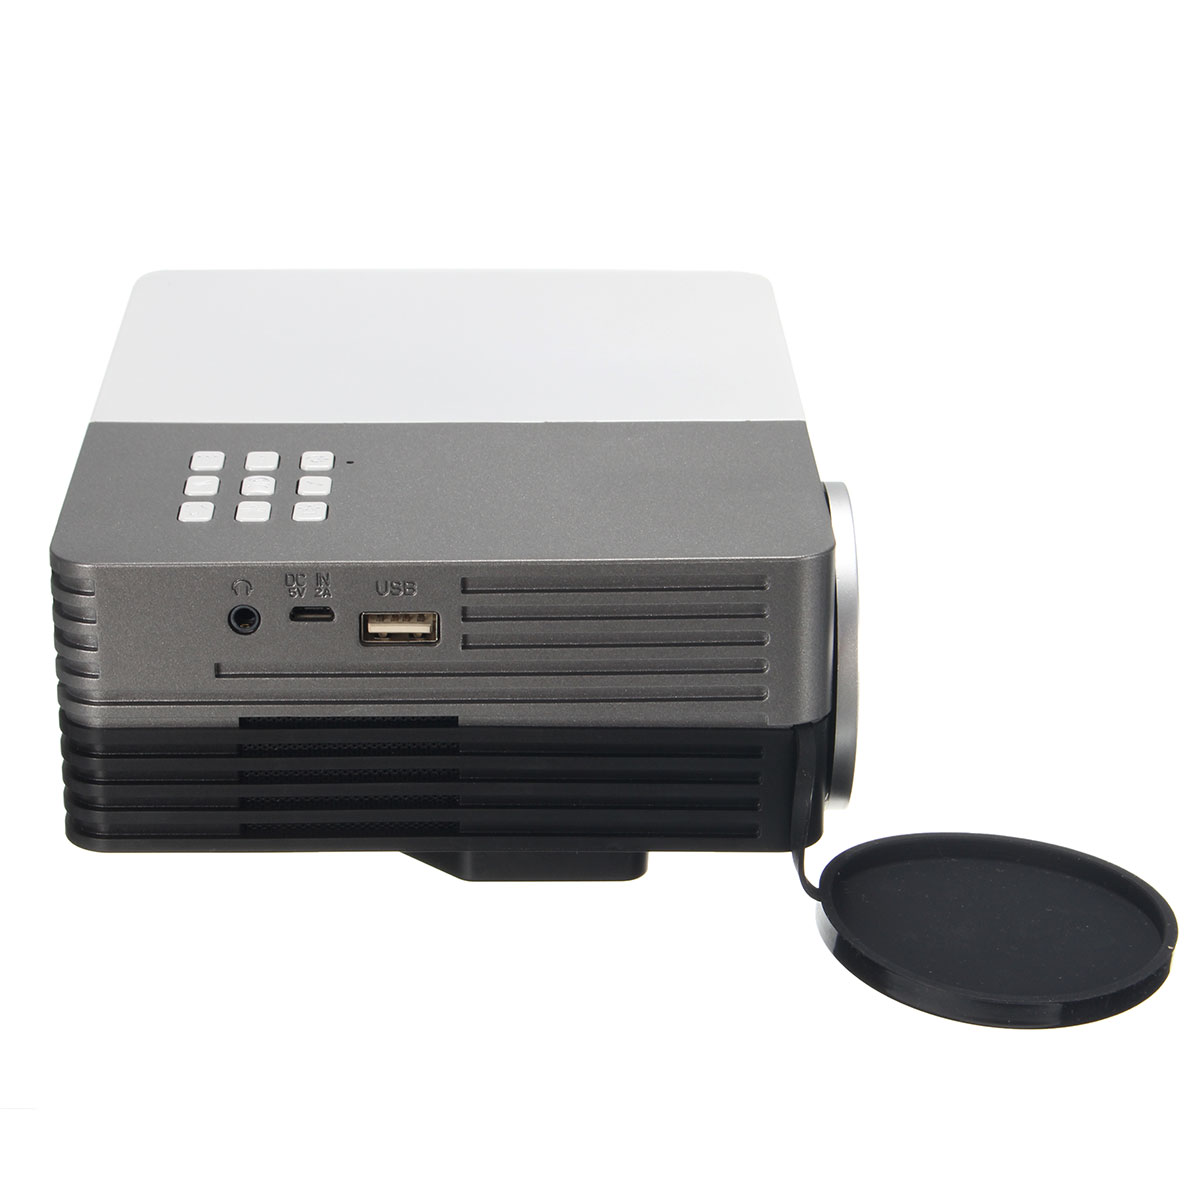 Gm50 1080p portable mini led vga 3d projector 150 lumens for Portable usb projector